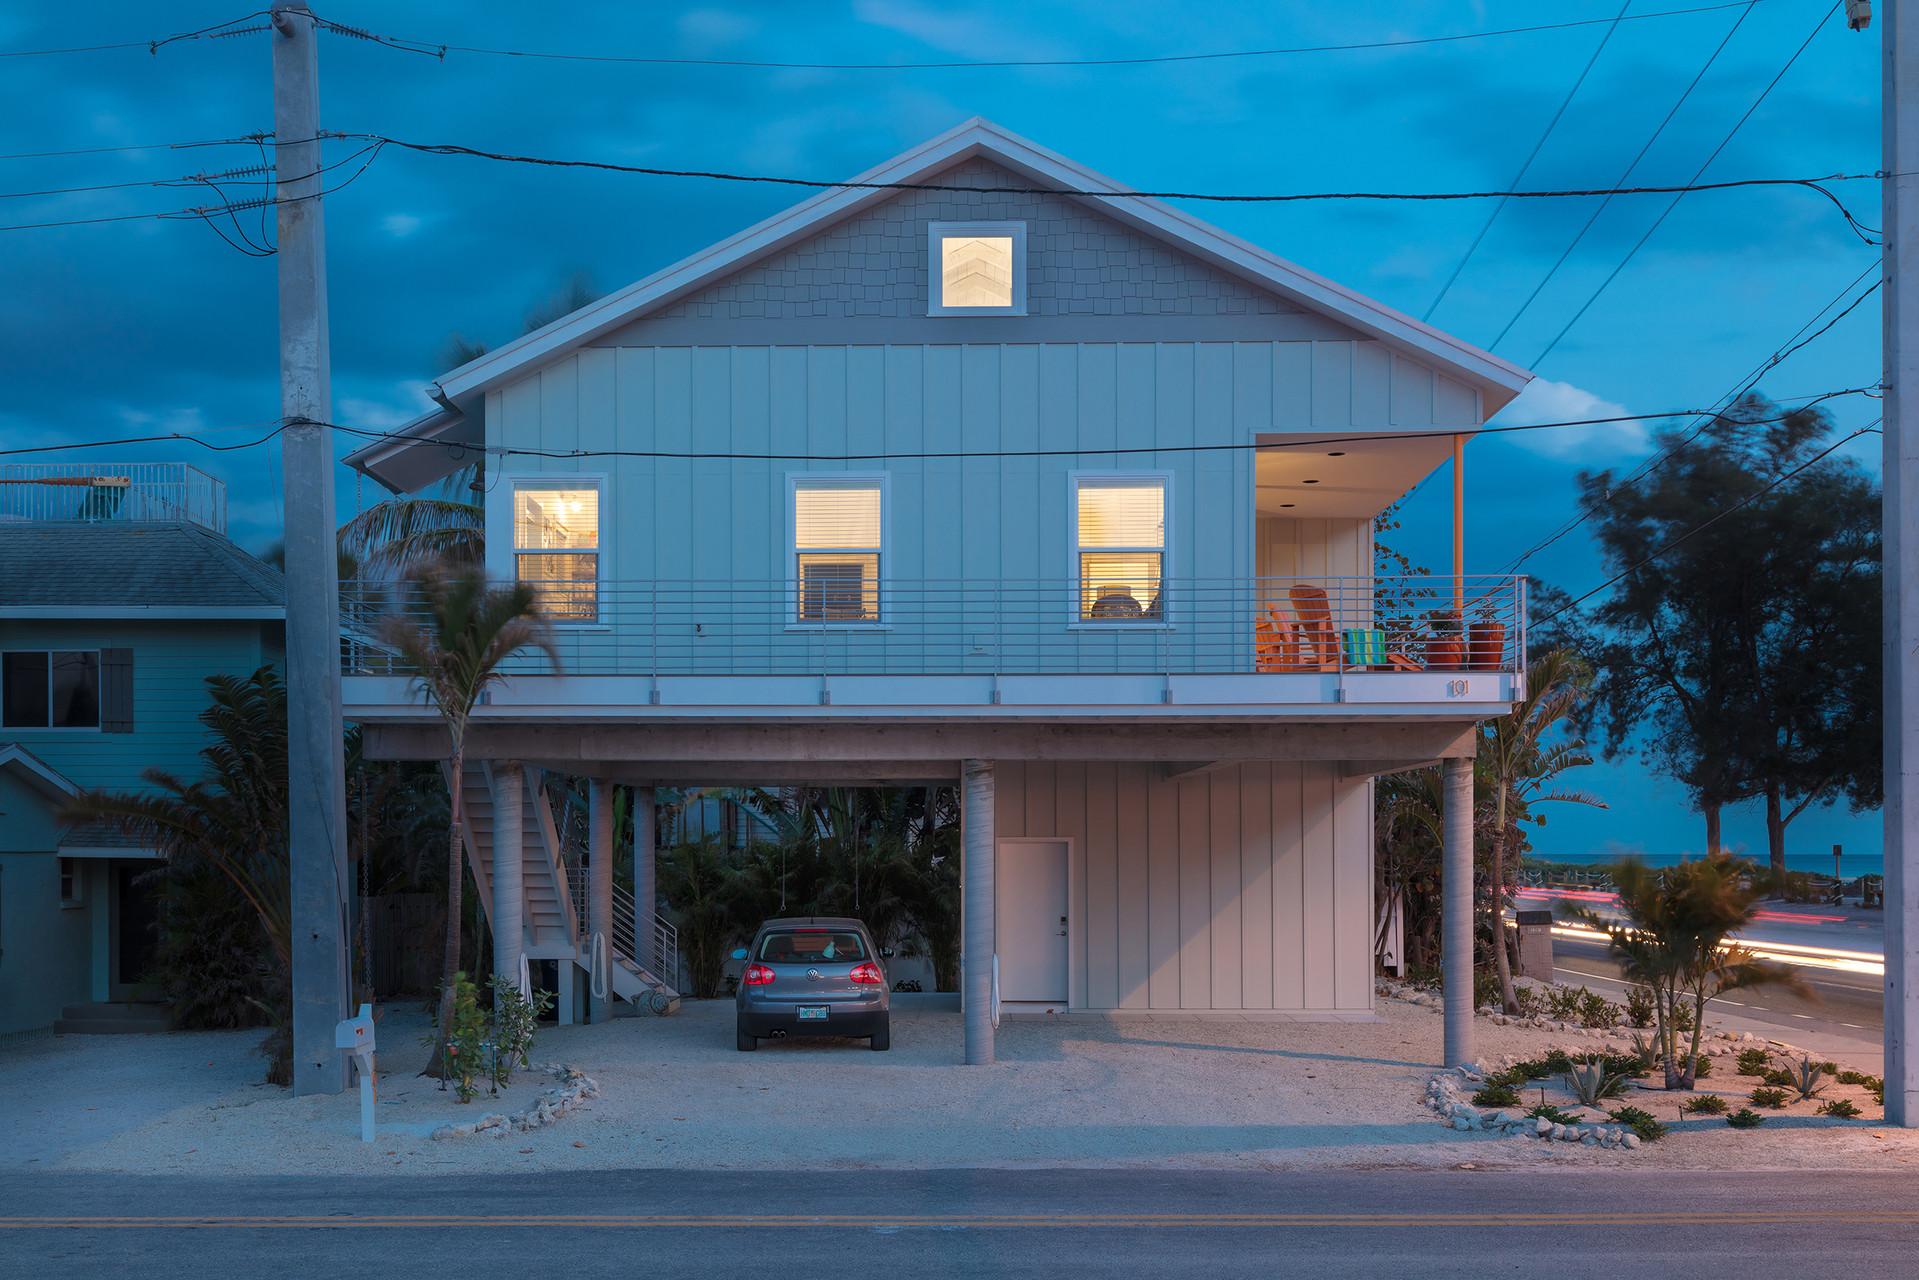 Surof House